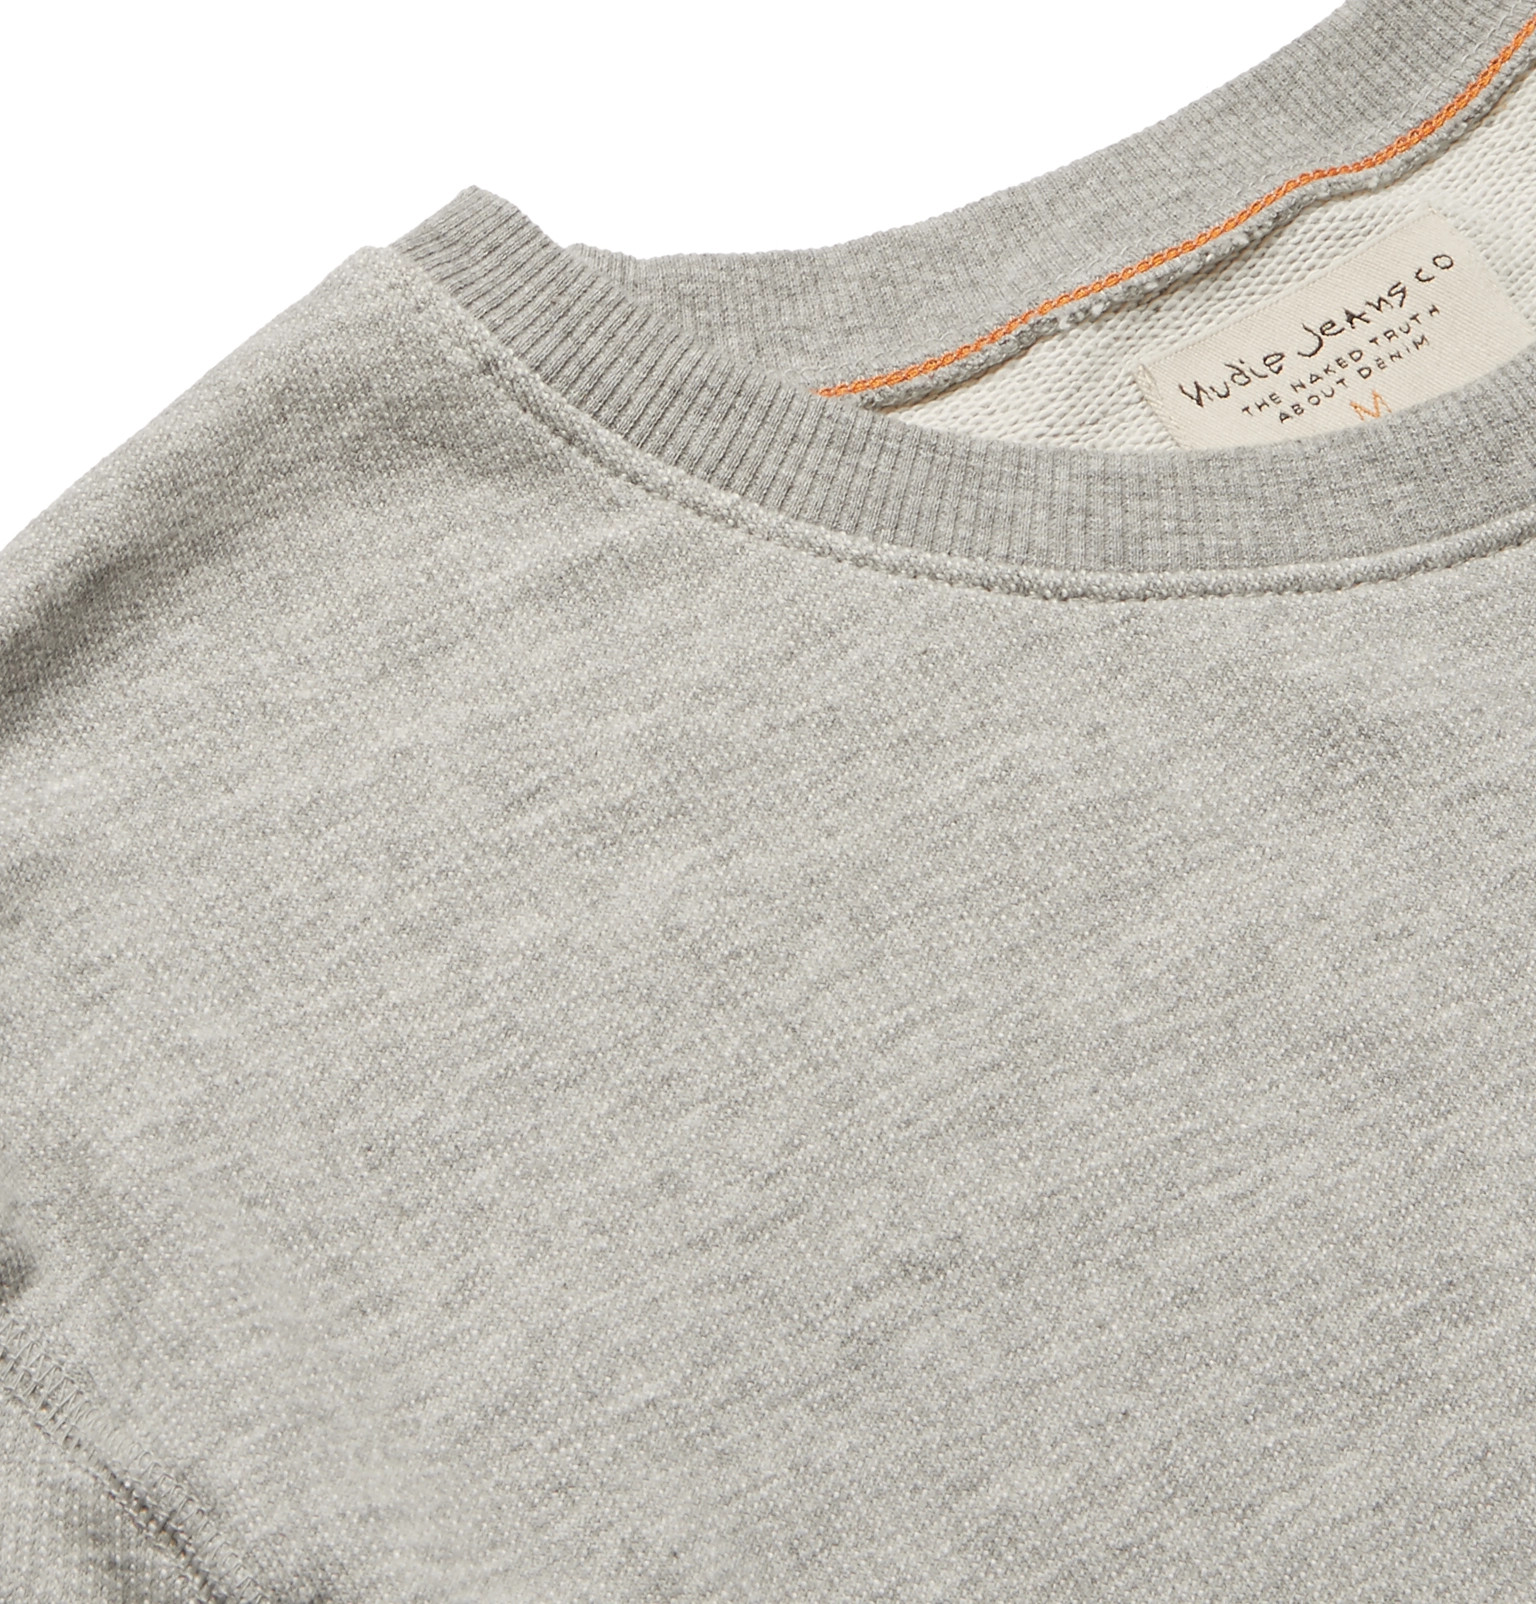 Mélange Jersey Organic Loopback Jeansevert Cotton Nudie Sweatshirt 5qU1nt